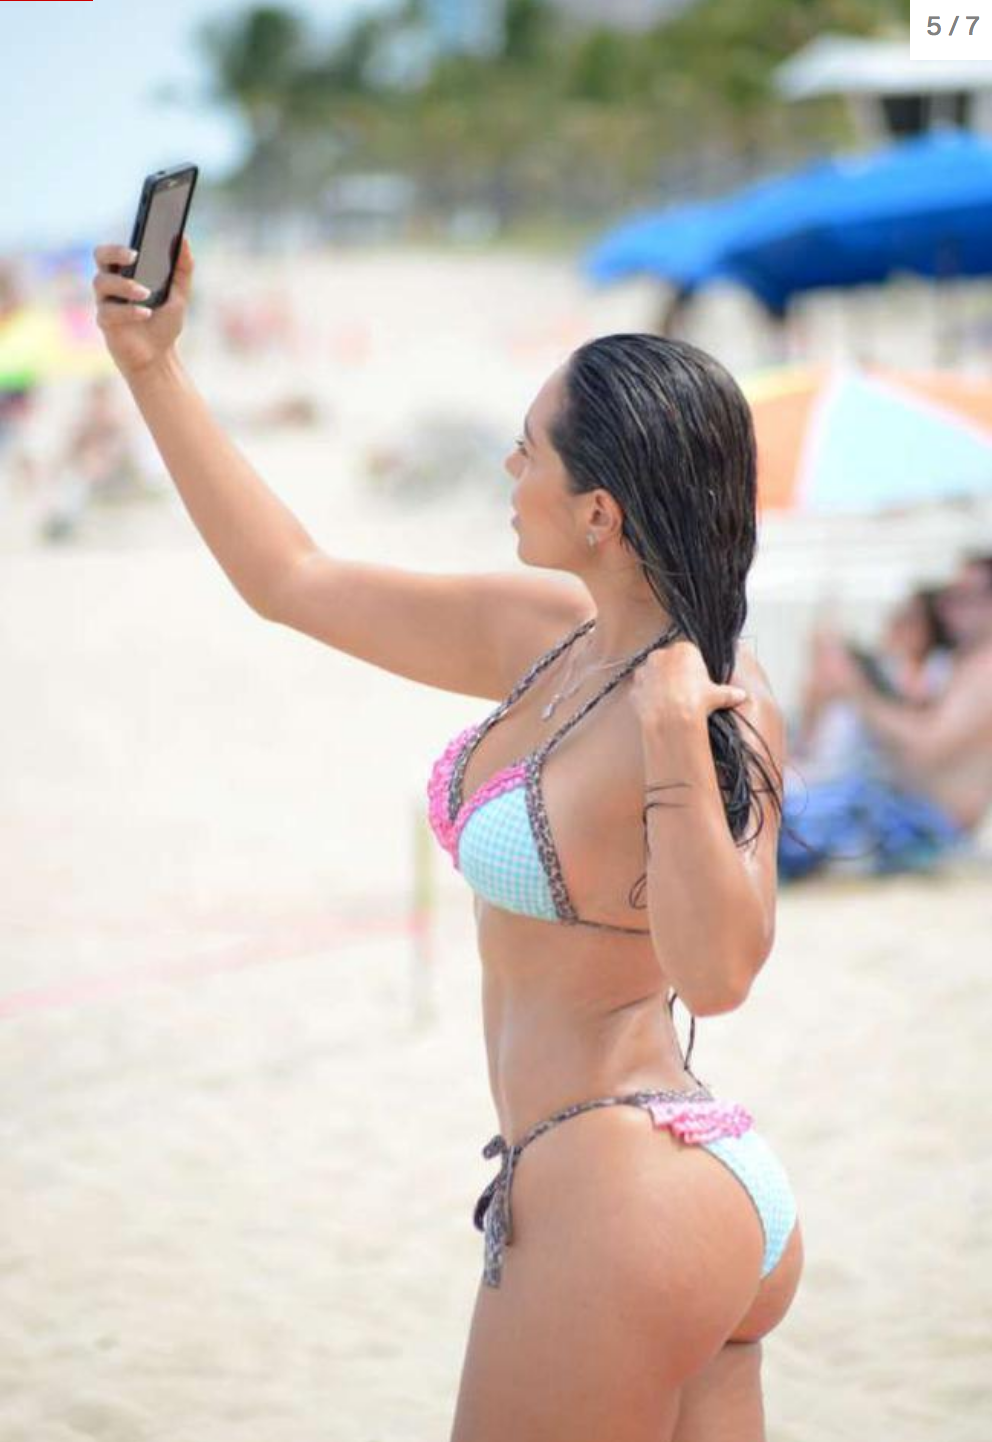 Ass Andrea Calle nudes (57 photos), Ass, Sideboobs, Selfie, see through 2018